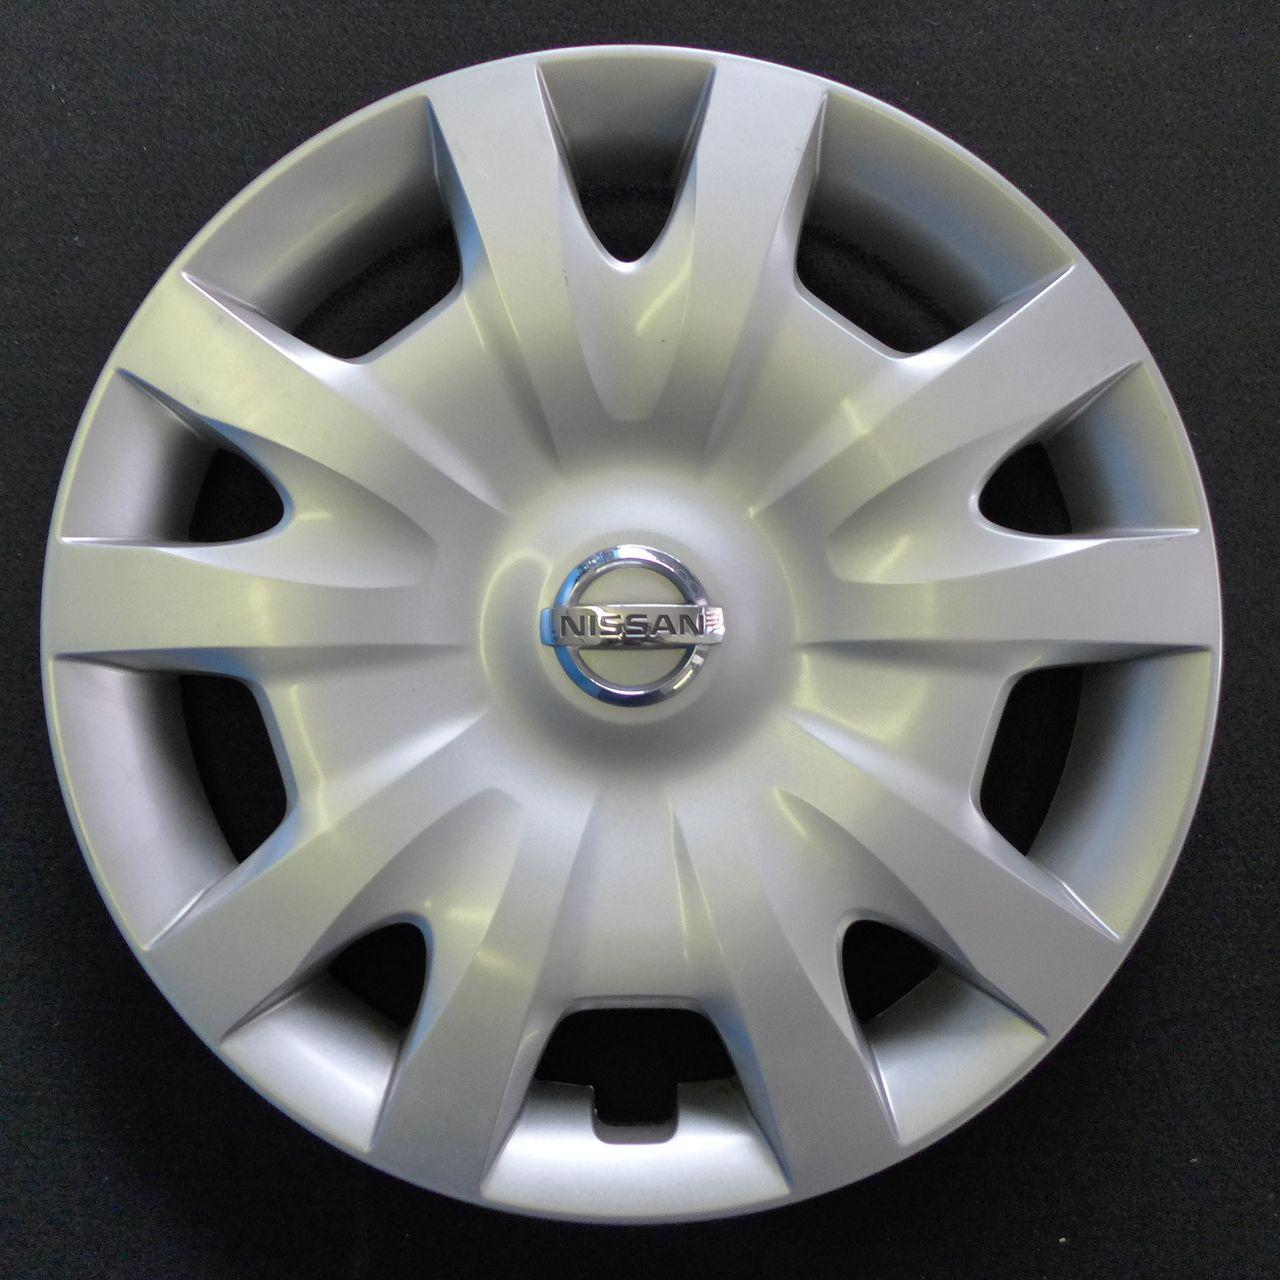 2011 2012 2013 nissan quest hubcap wheel cover 16 53086